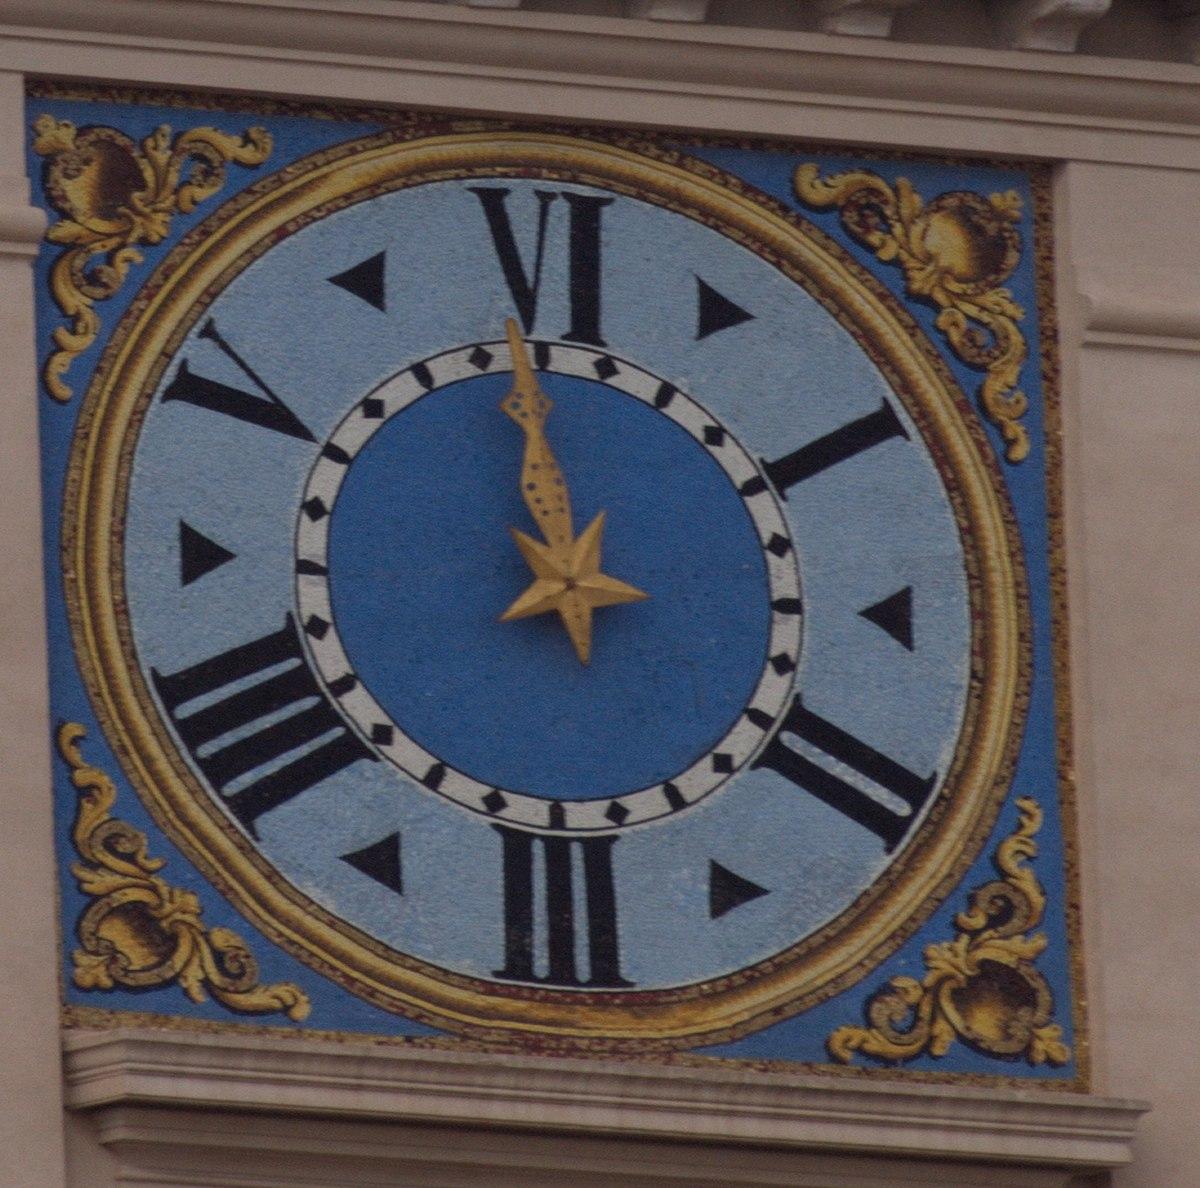 Italian six-hour clock - Wikipedia